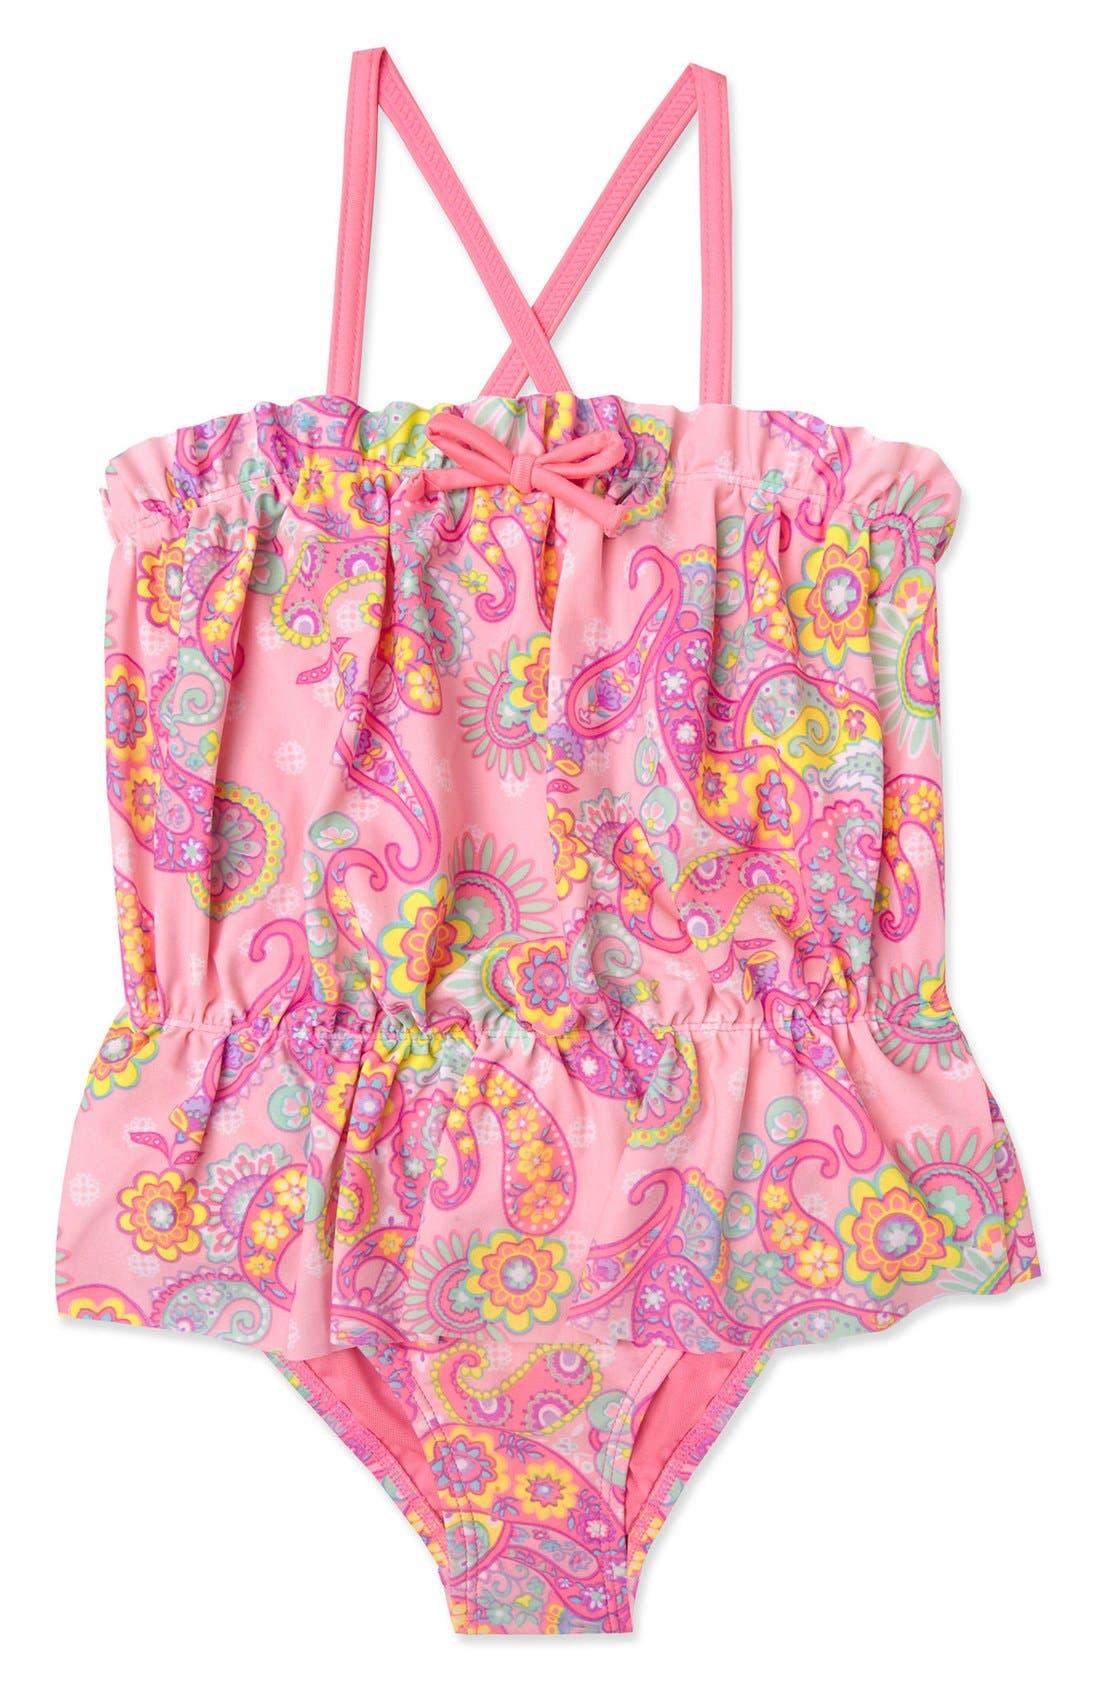 Main Image - Hula Star 'Enchanted Paisley' One-Piece Swimsuit (Toddler Girls & Little Girls)